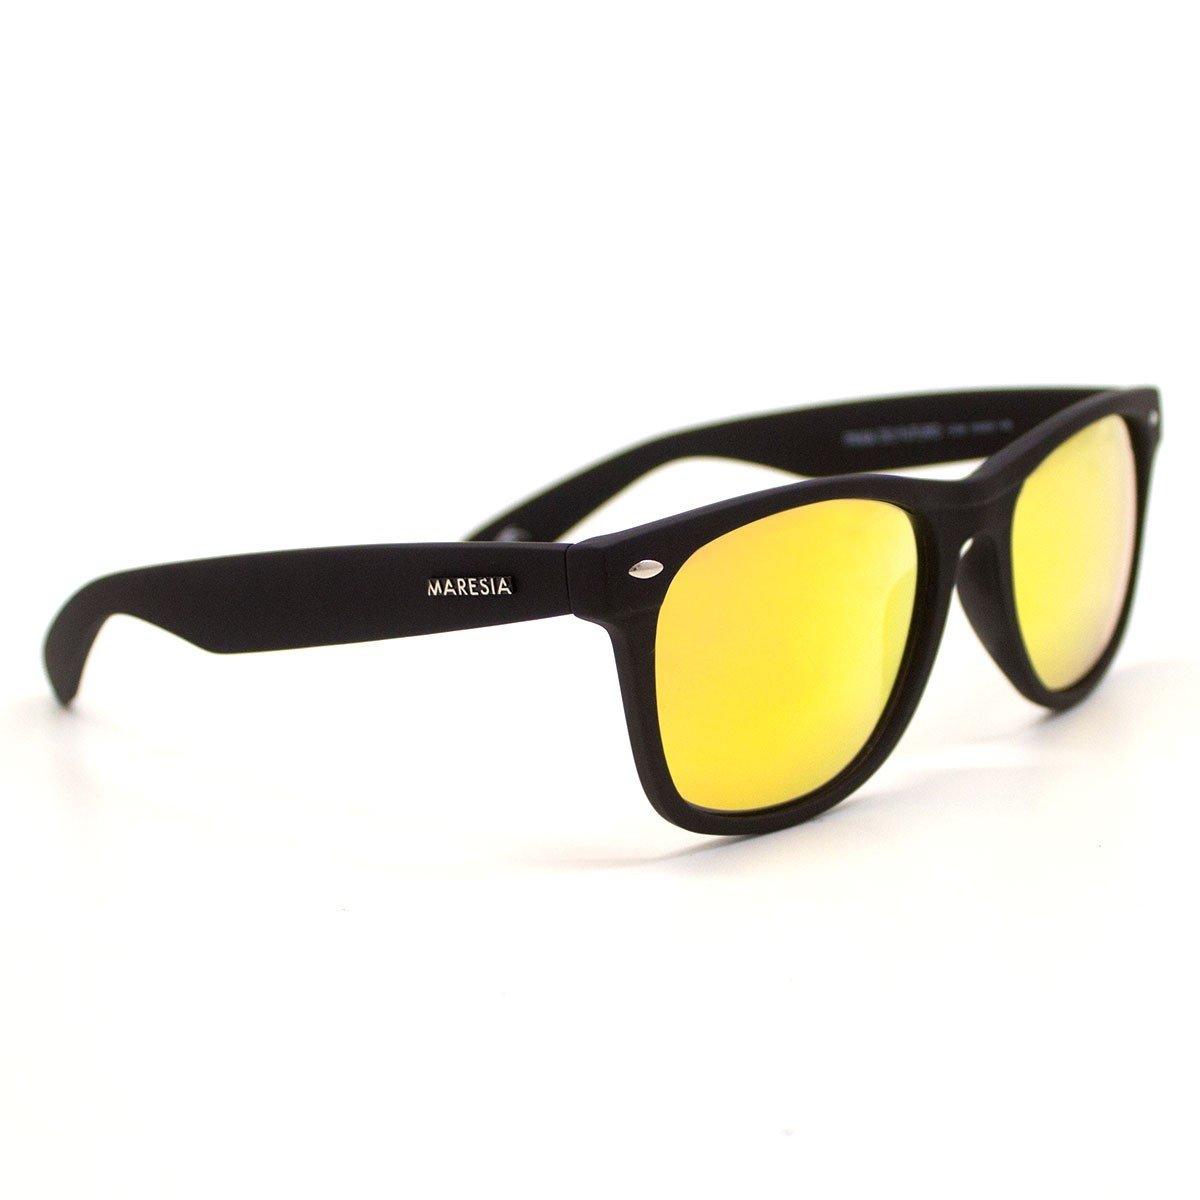 Óculos De Sol Maresia Óculos Unisex Maresia Praia Do Futuro - Compre Agora    Netshoes 268d4bd985